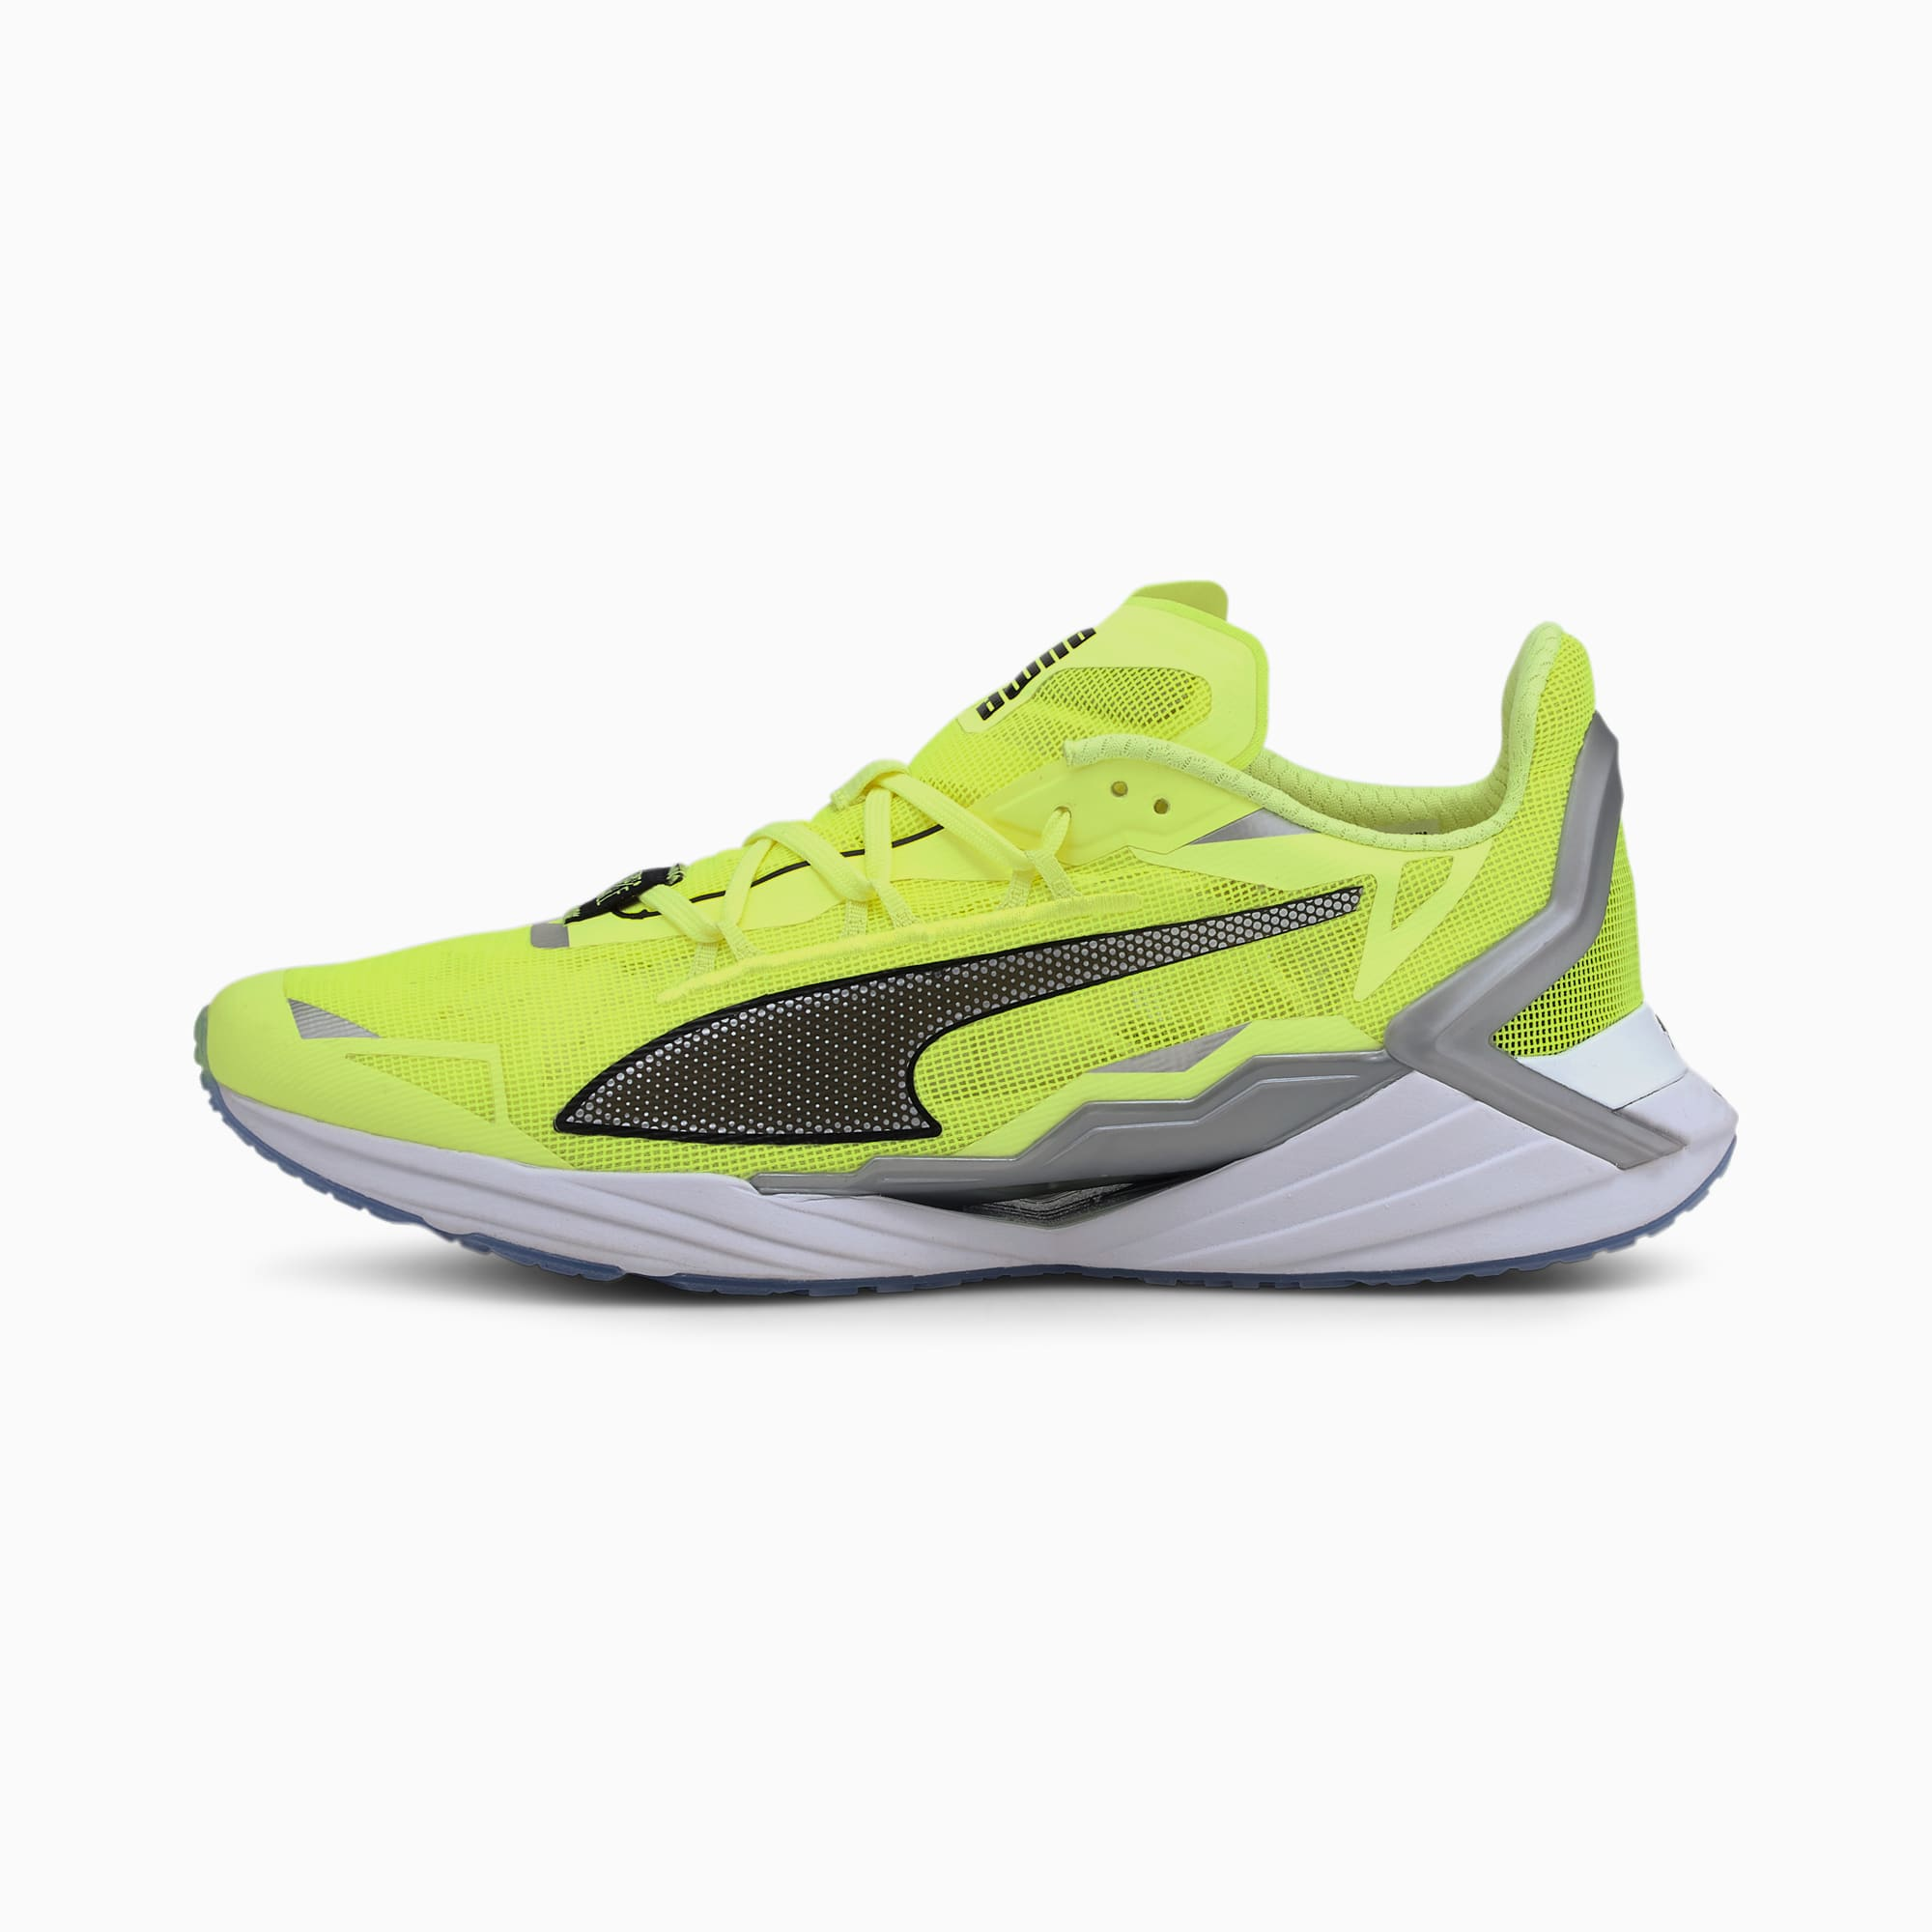 prenotazione fibra fascio  PUMA x FIRST MILE UltraRide Xtreme Men's Running Shoes | PUMA US